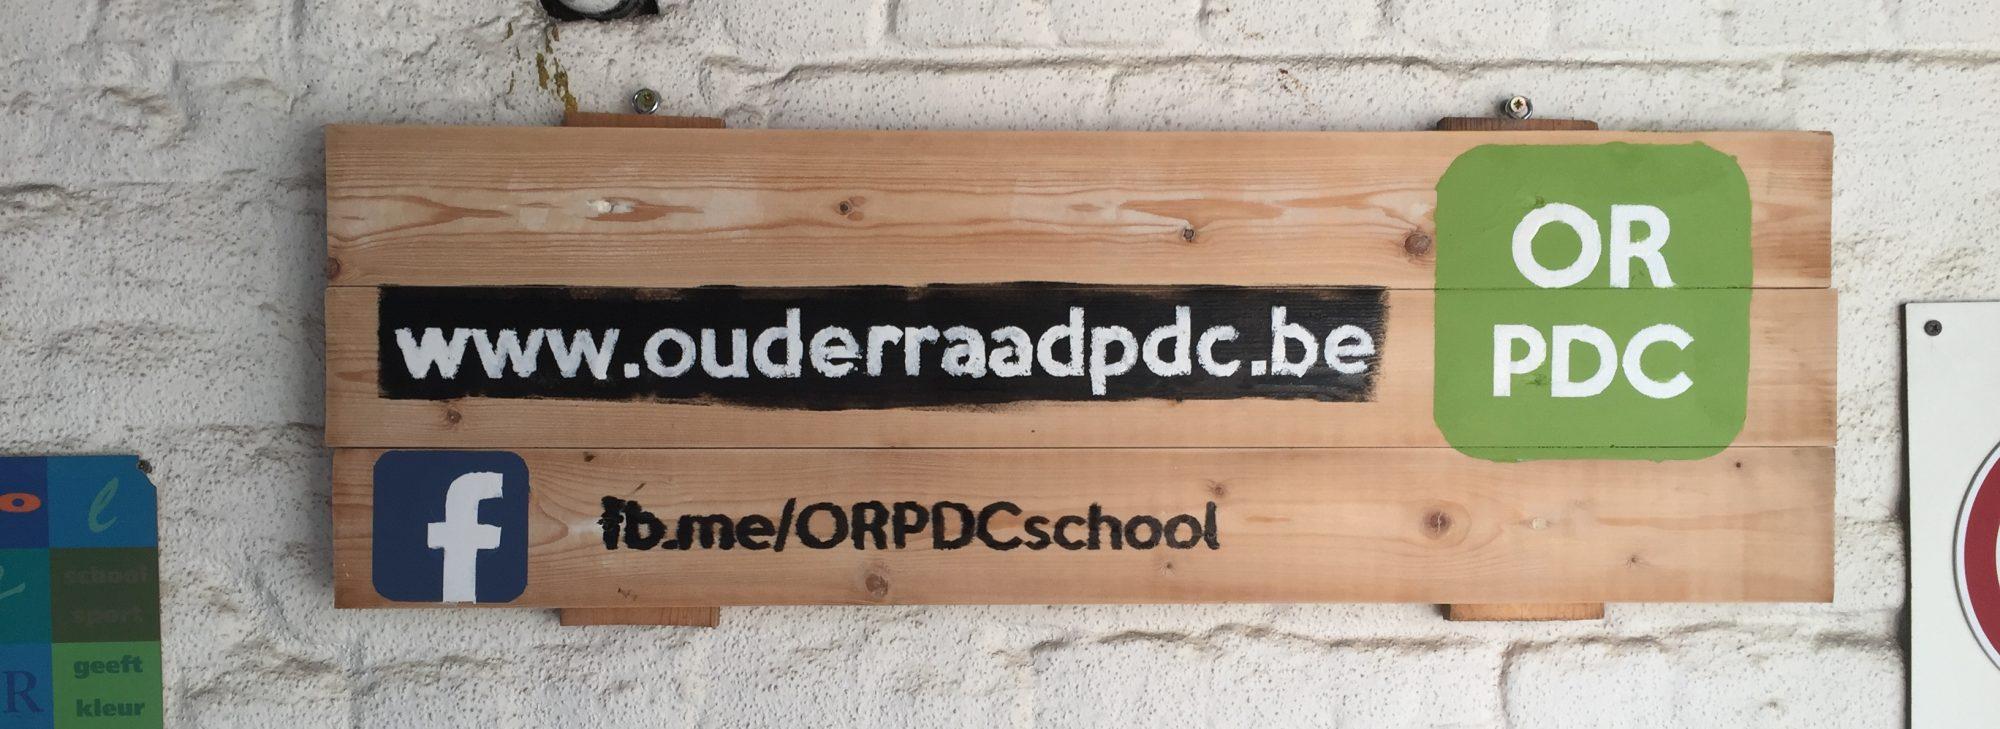 OuderraadPDC